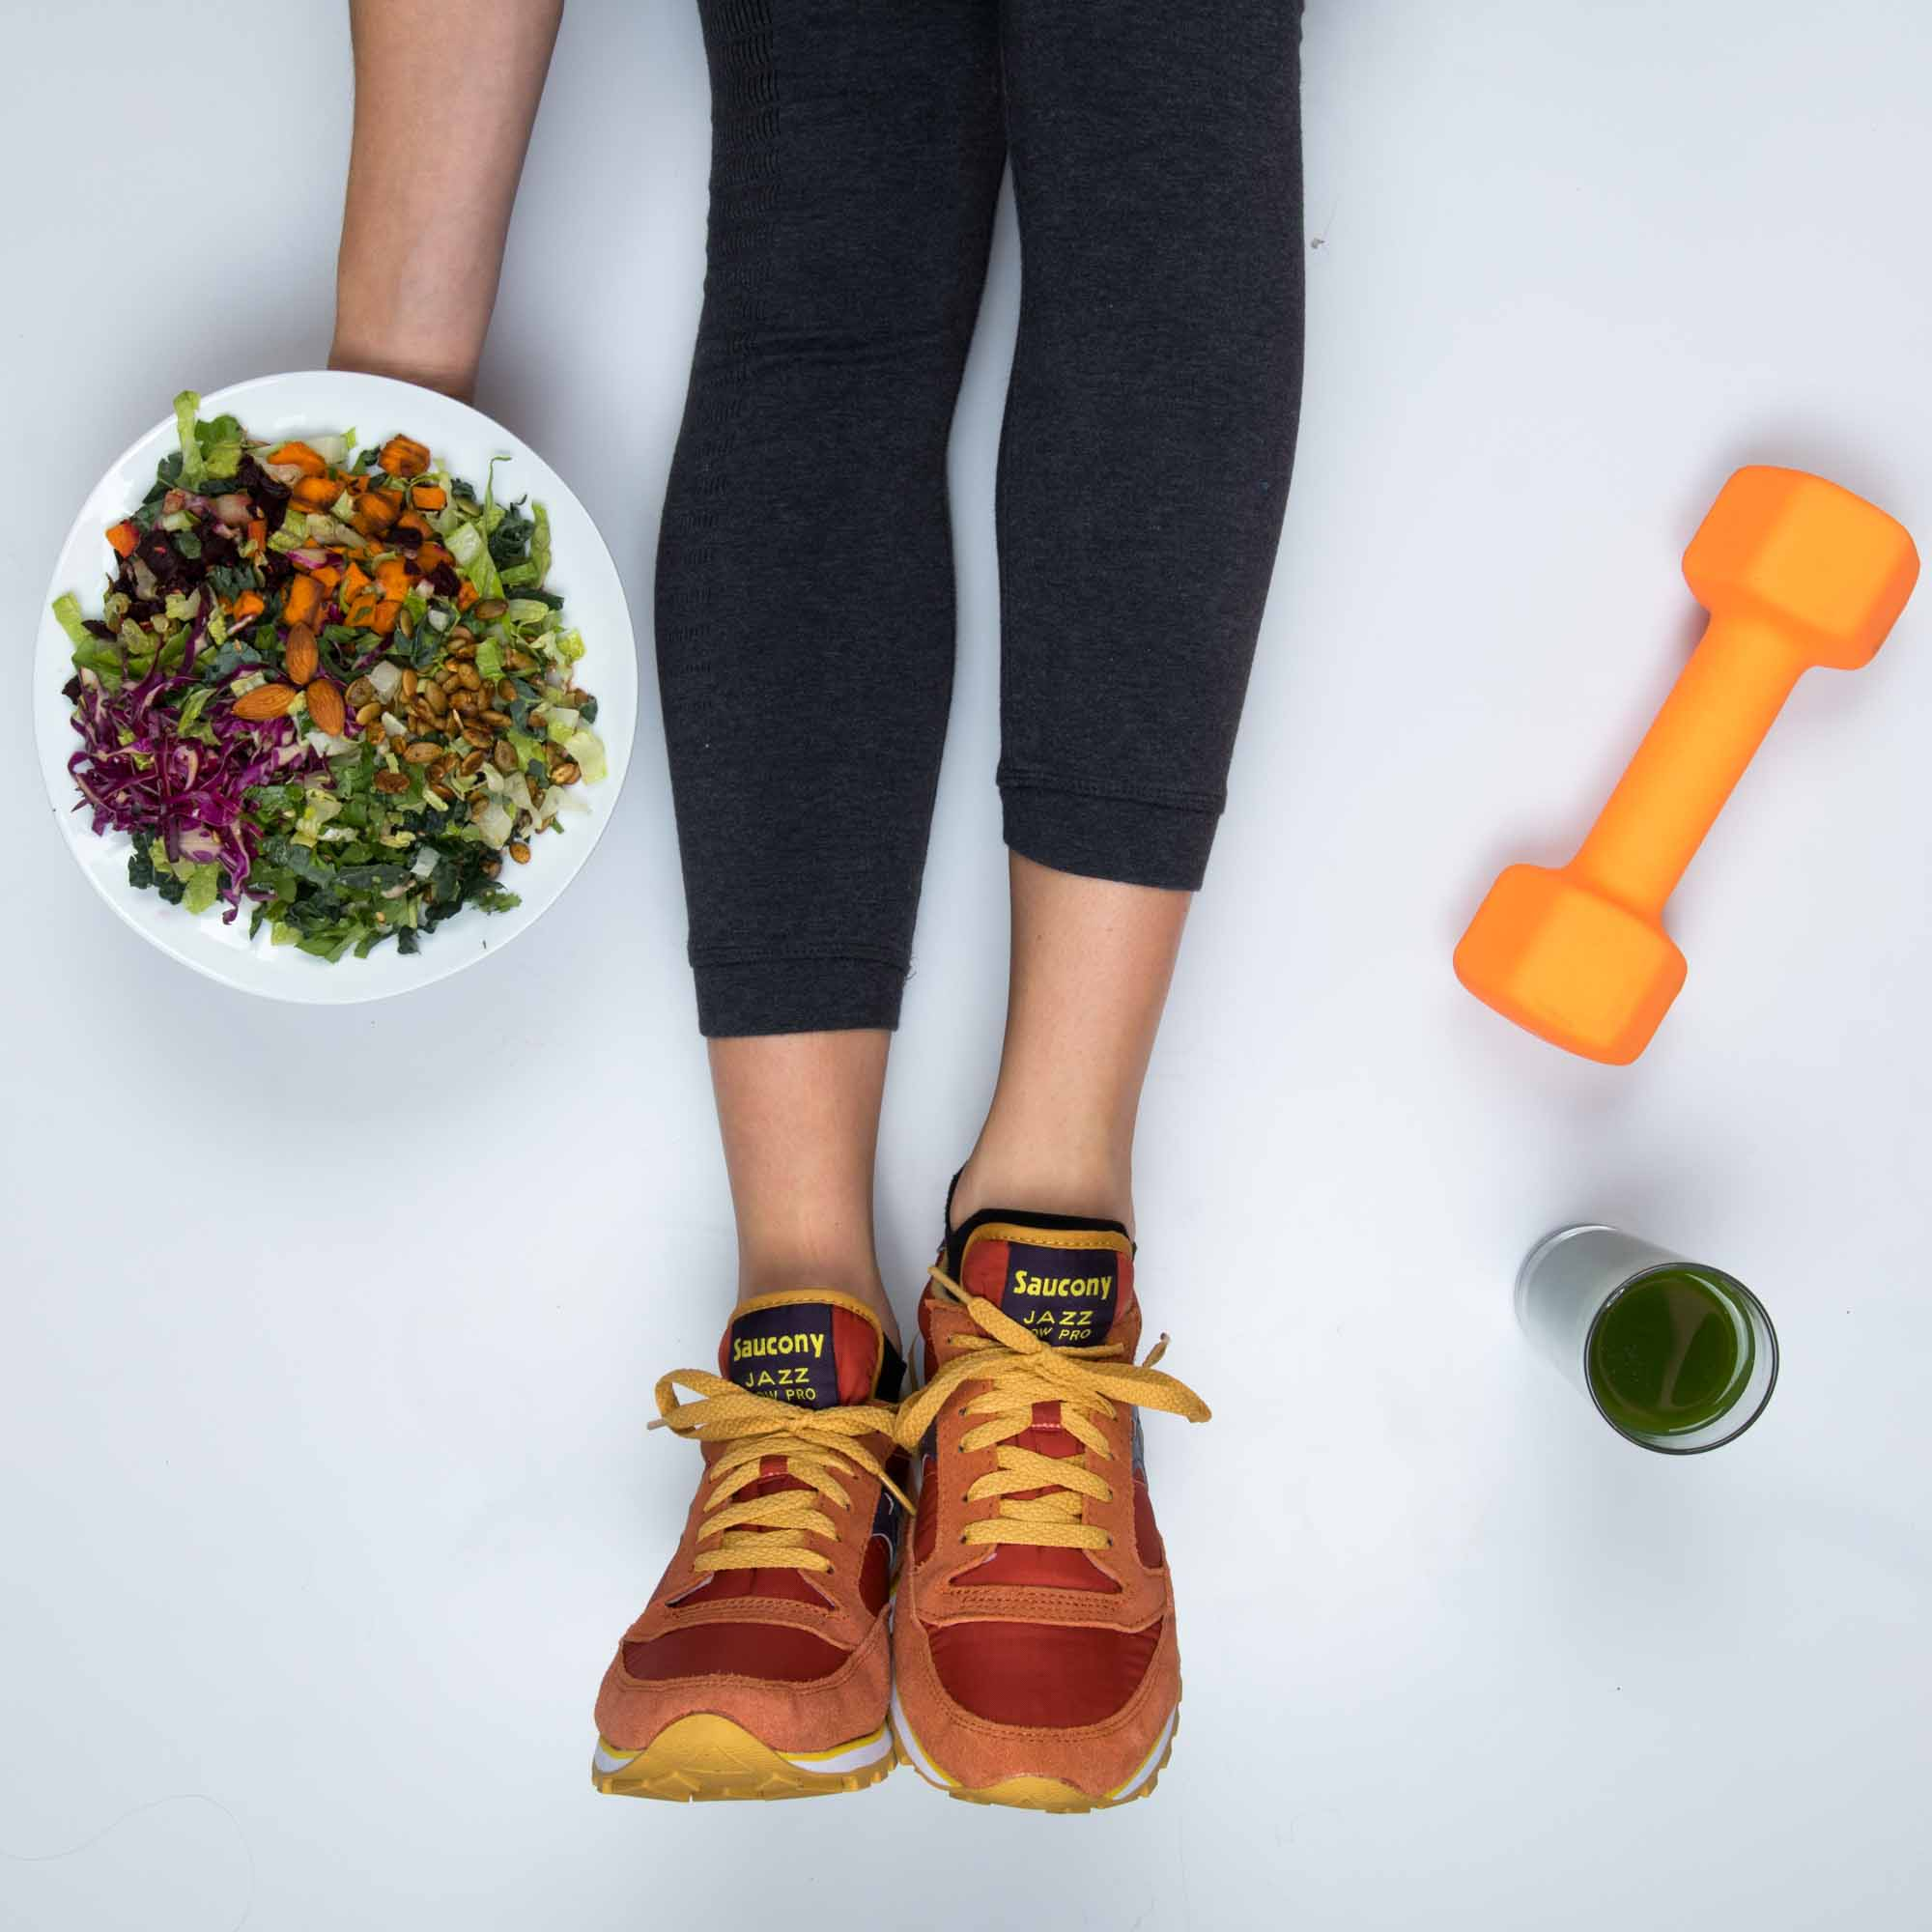 Juicero X 22 Days Nutrition -14.jpg